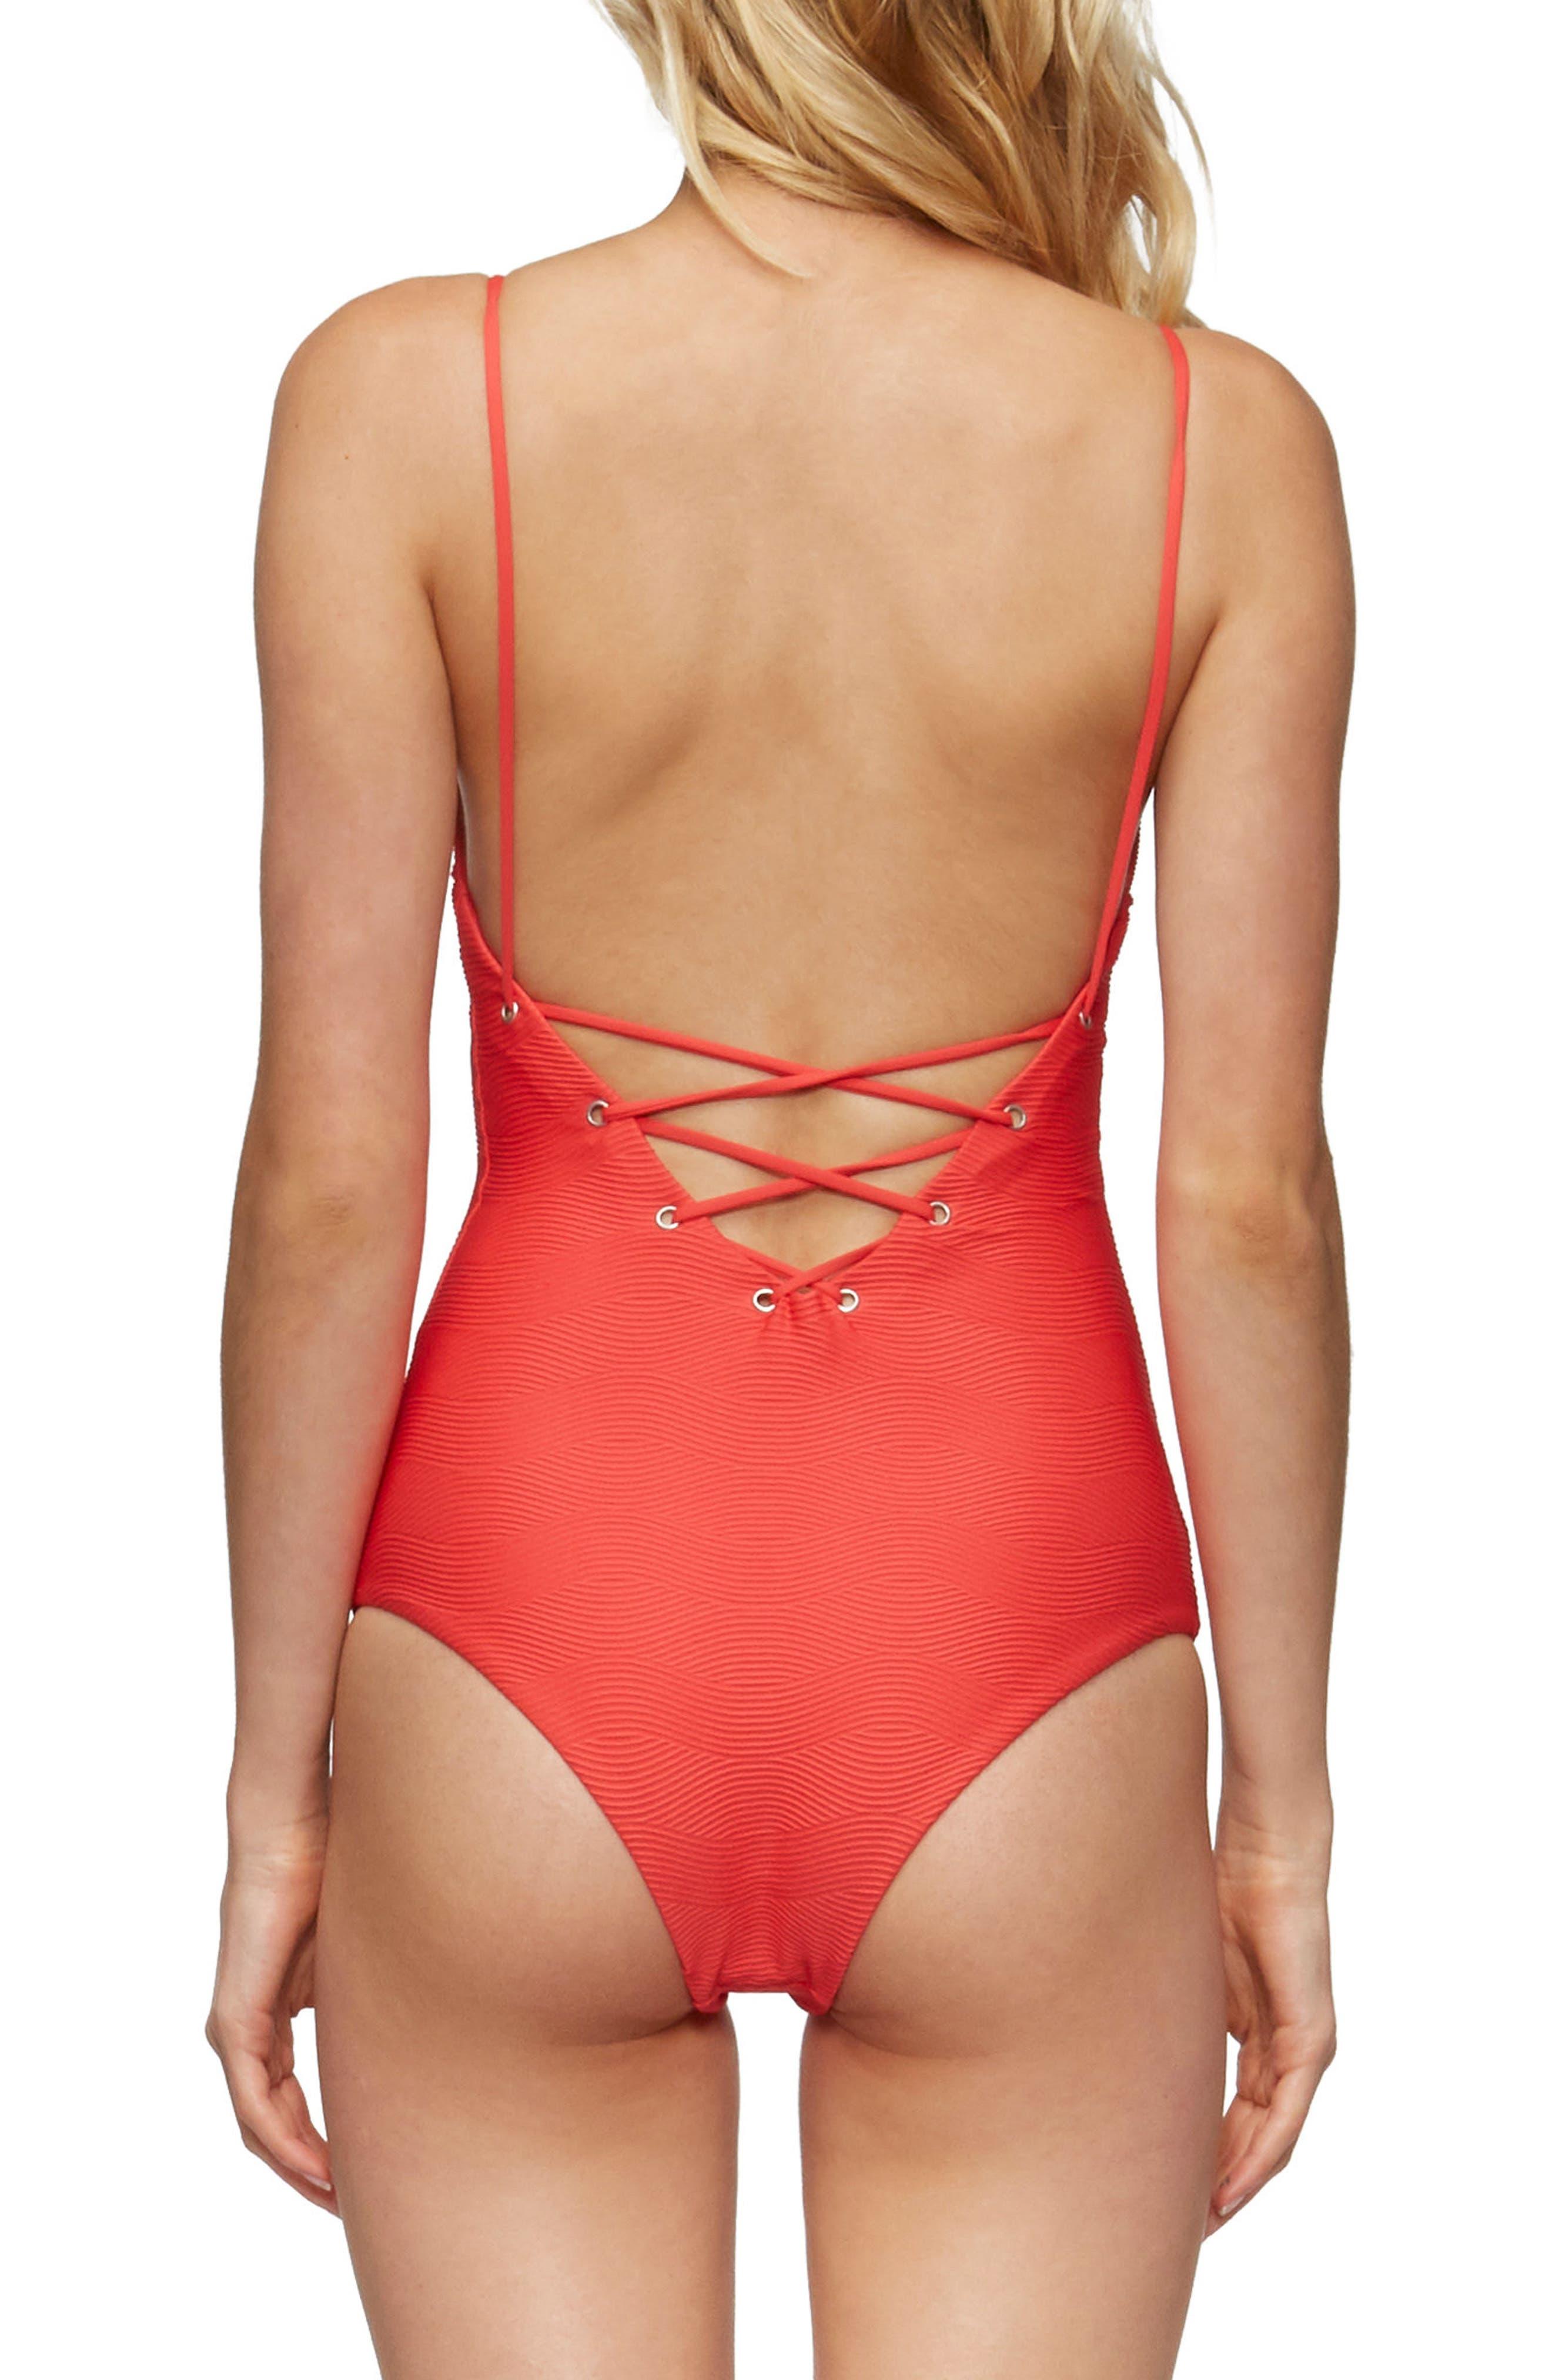 Monahan One-Piece Swimsuit,                             Alternate thumbnail 2, color,                             600